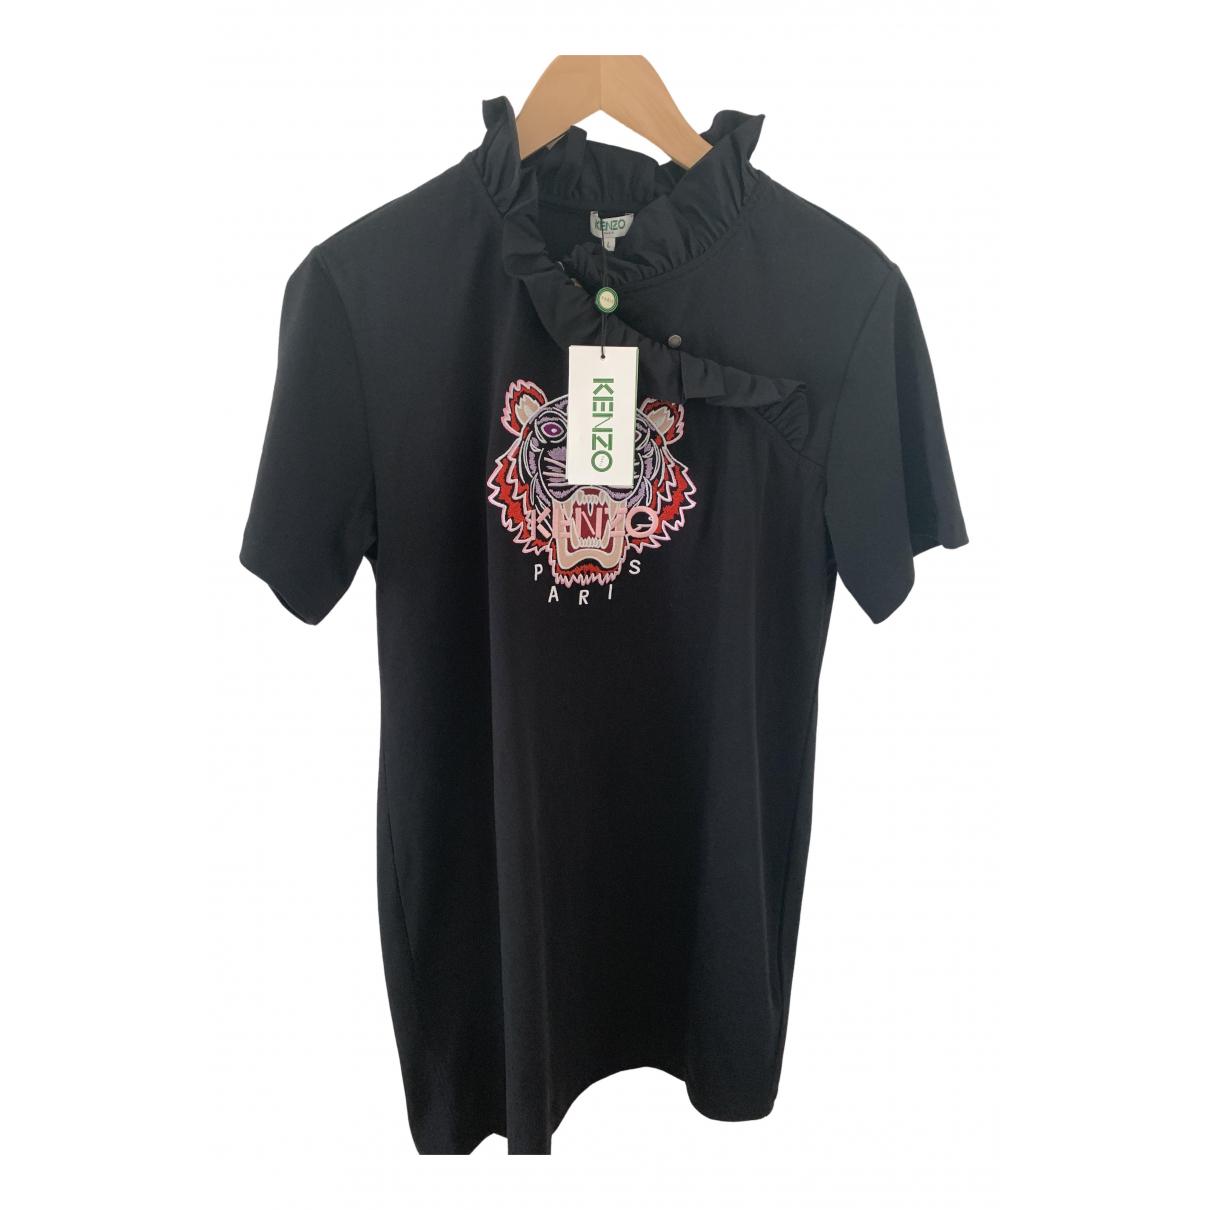 Kenzo \N Black Cotton dress for Women 40 FR